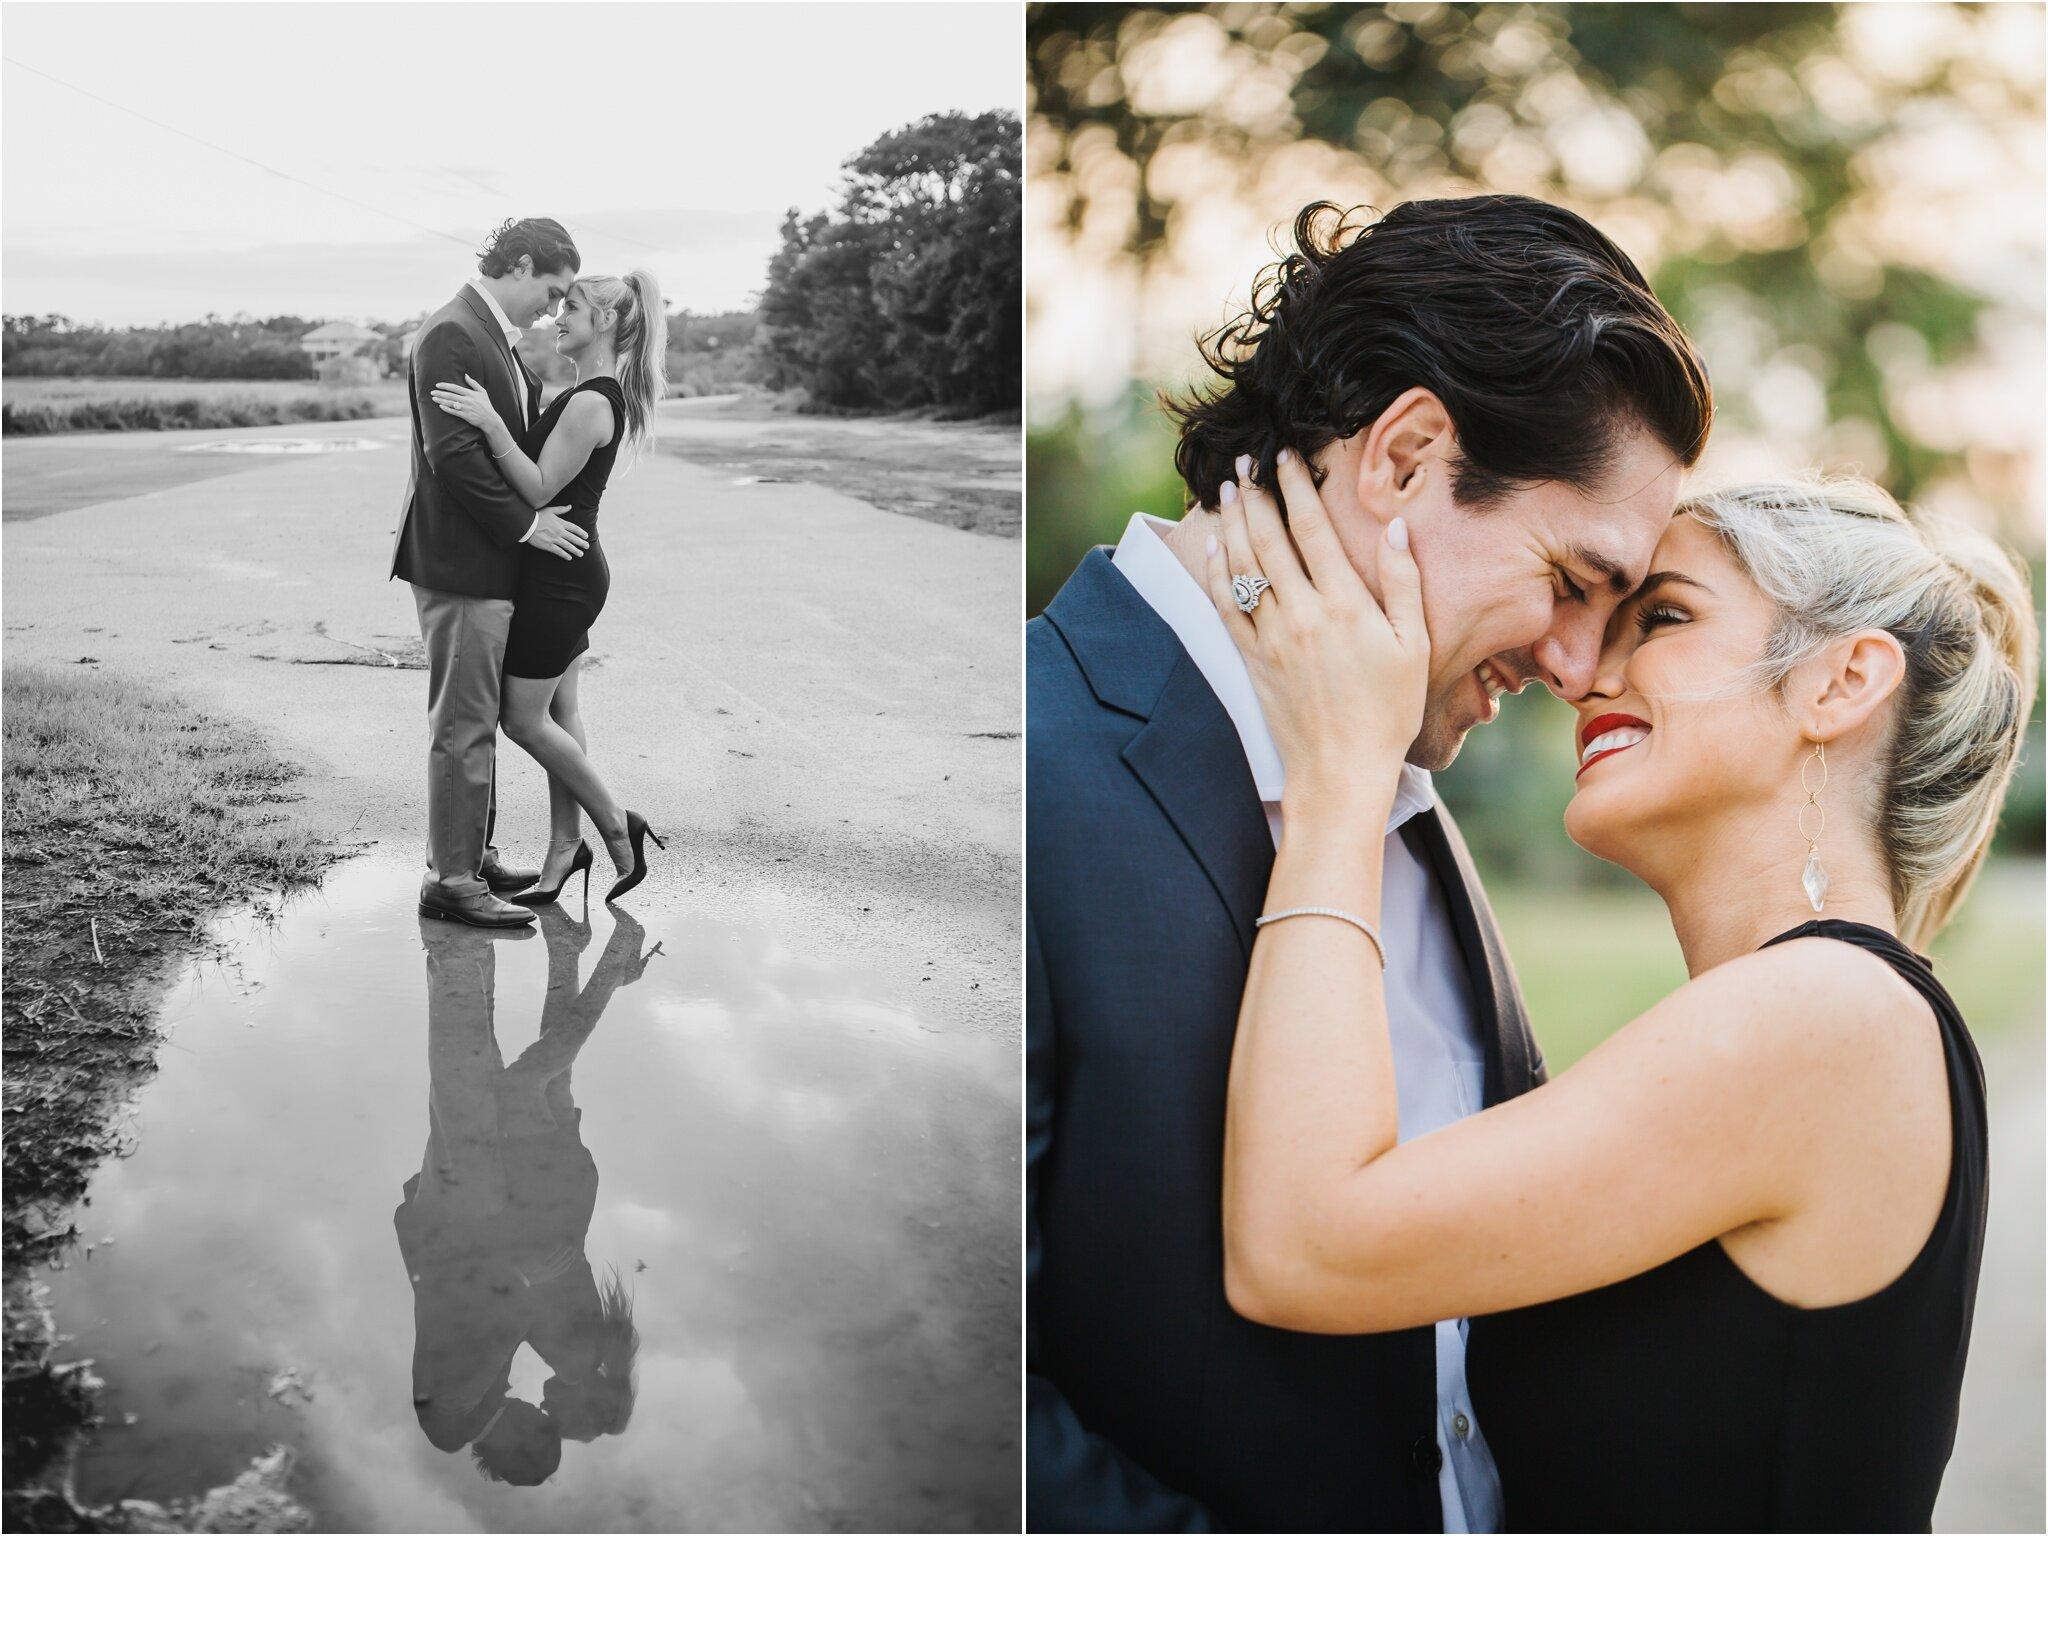 Rainey_Gregg_Photography_St._Simons_Island_Georgia_California_Wedding_Portrait_Photography_1850.jpg